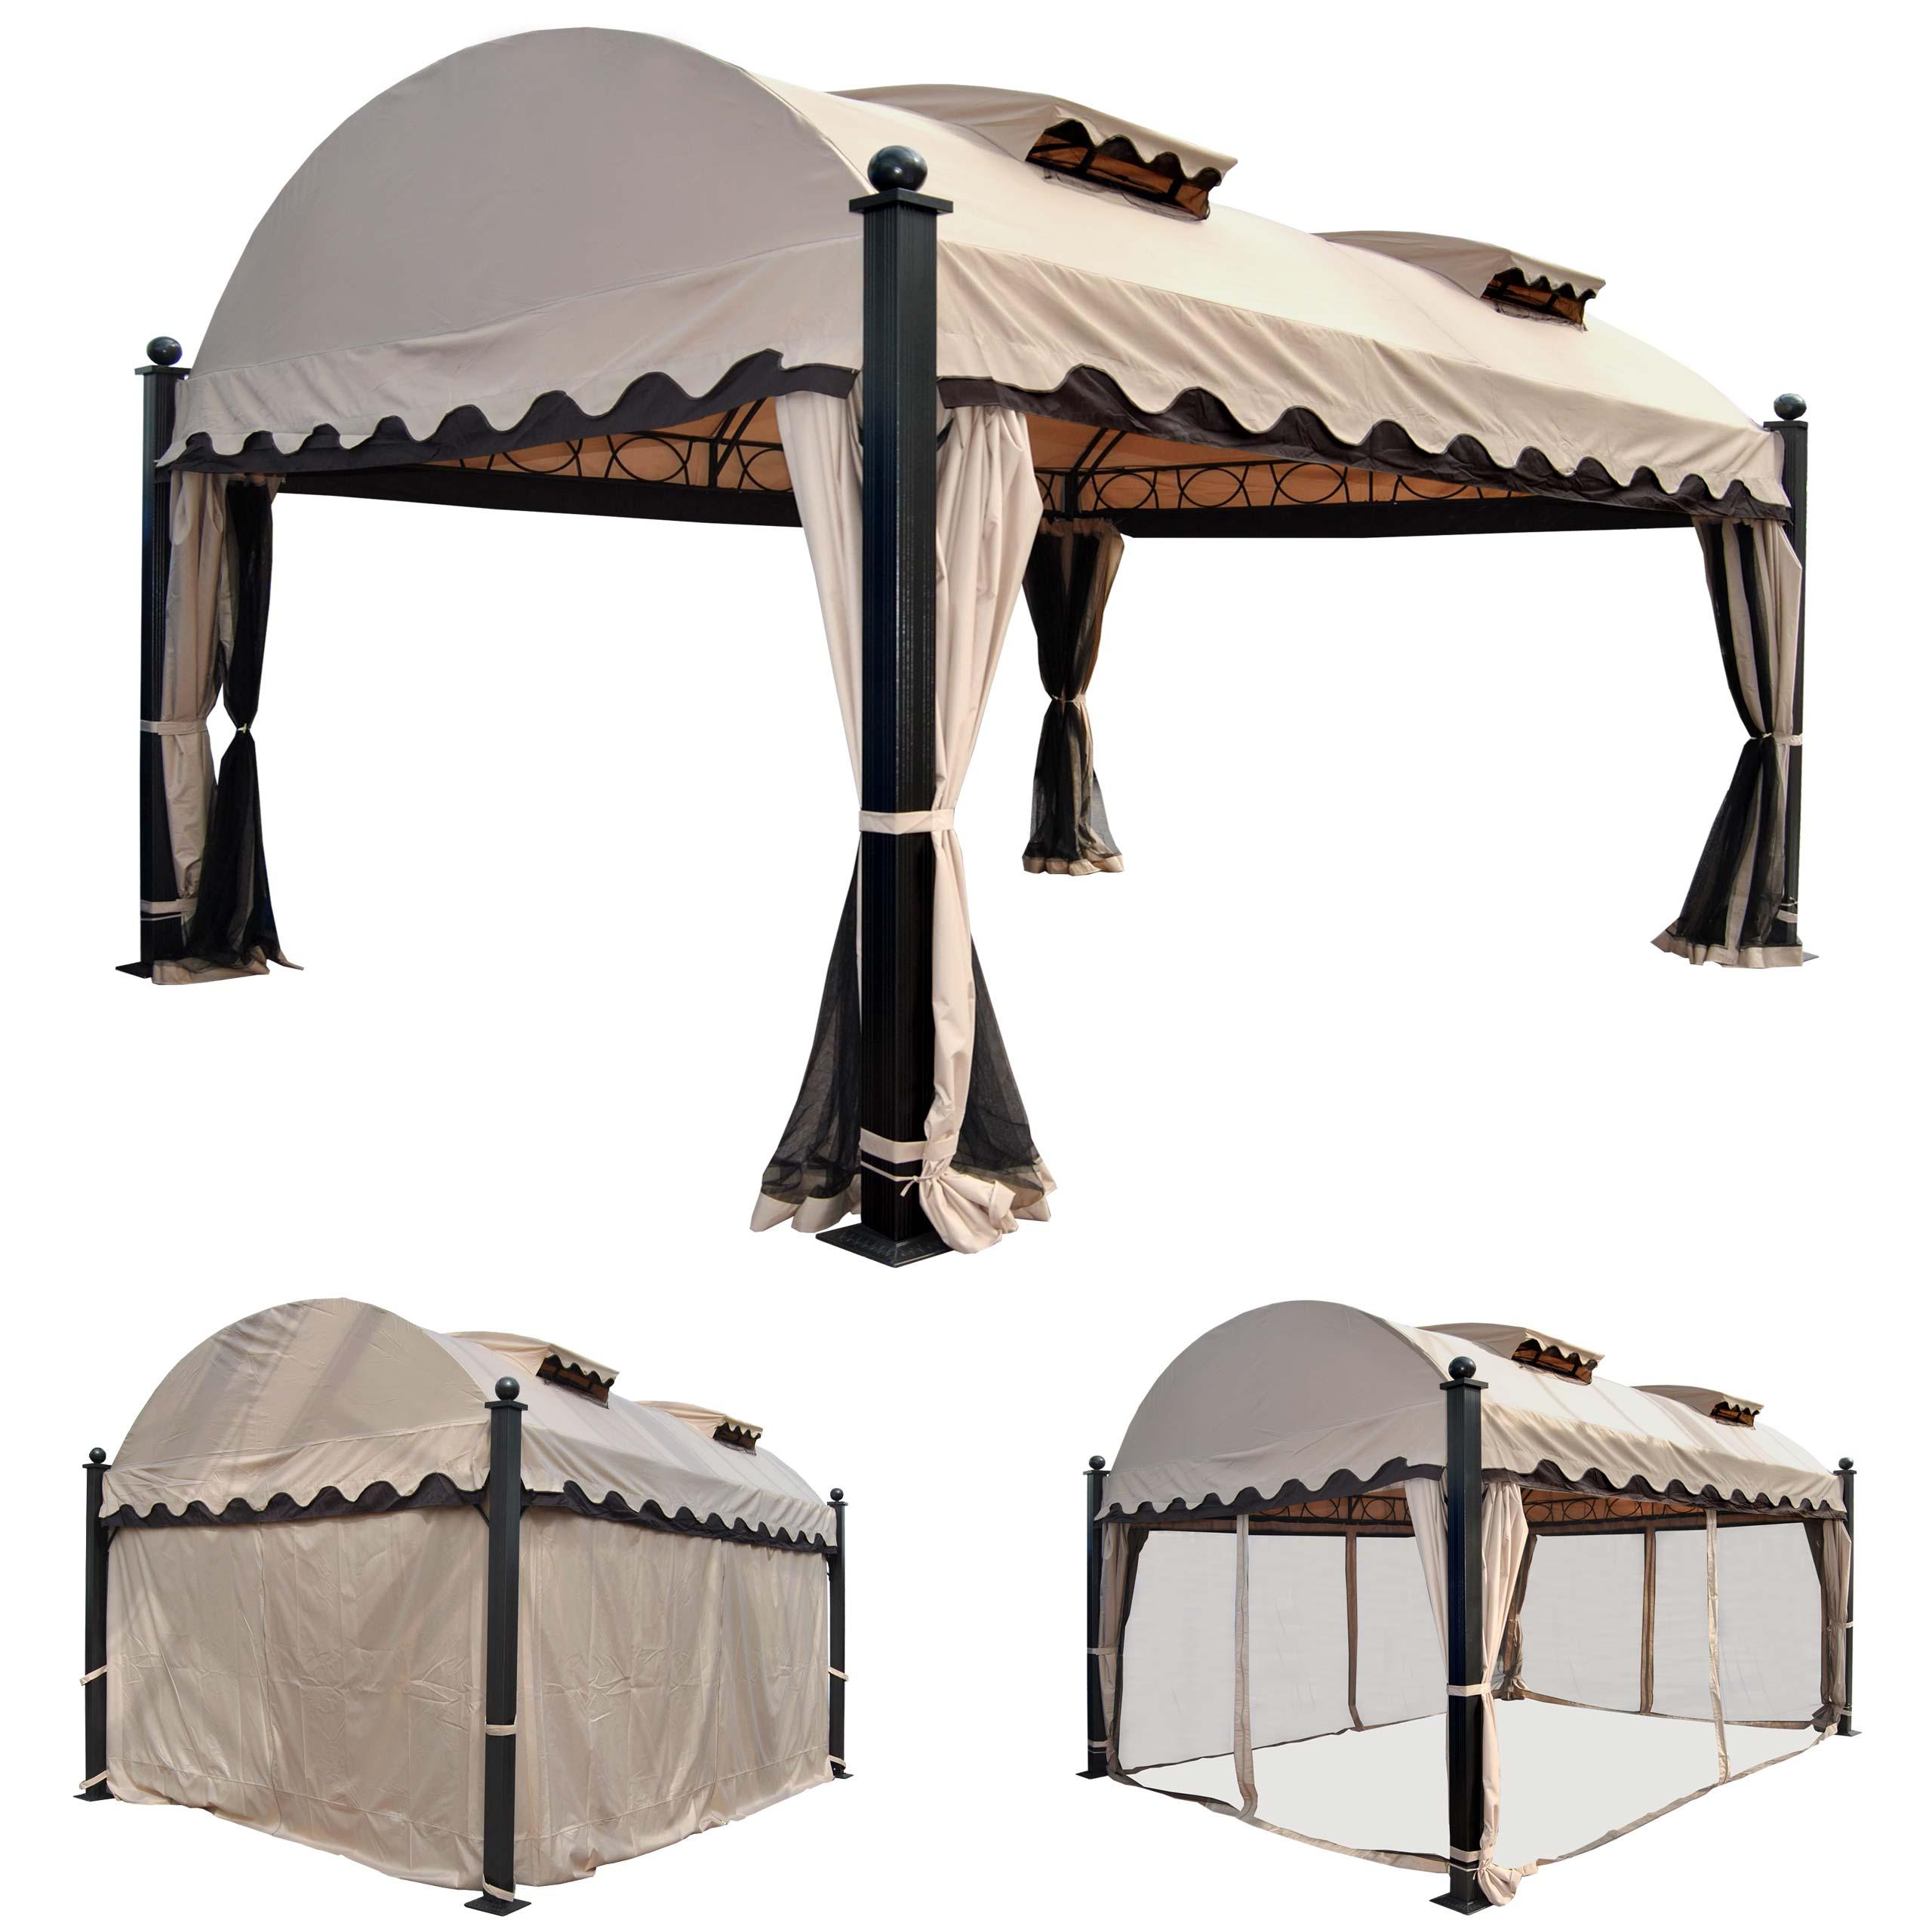 pergola daroca garten pavillon stabiles 10cm luxus alu. Black Bedroom Furniture Sets. Home Design Ideas